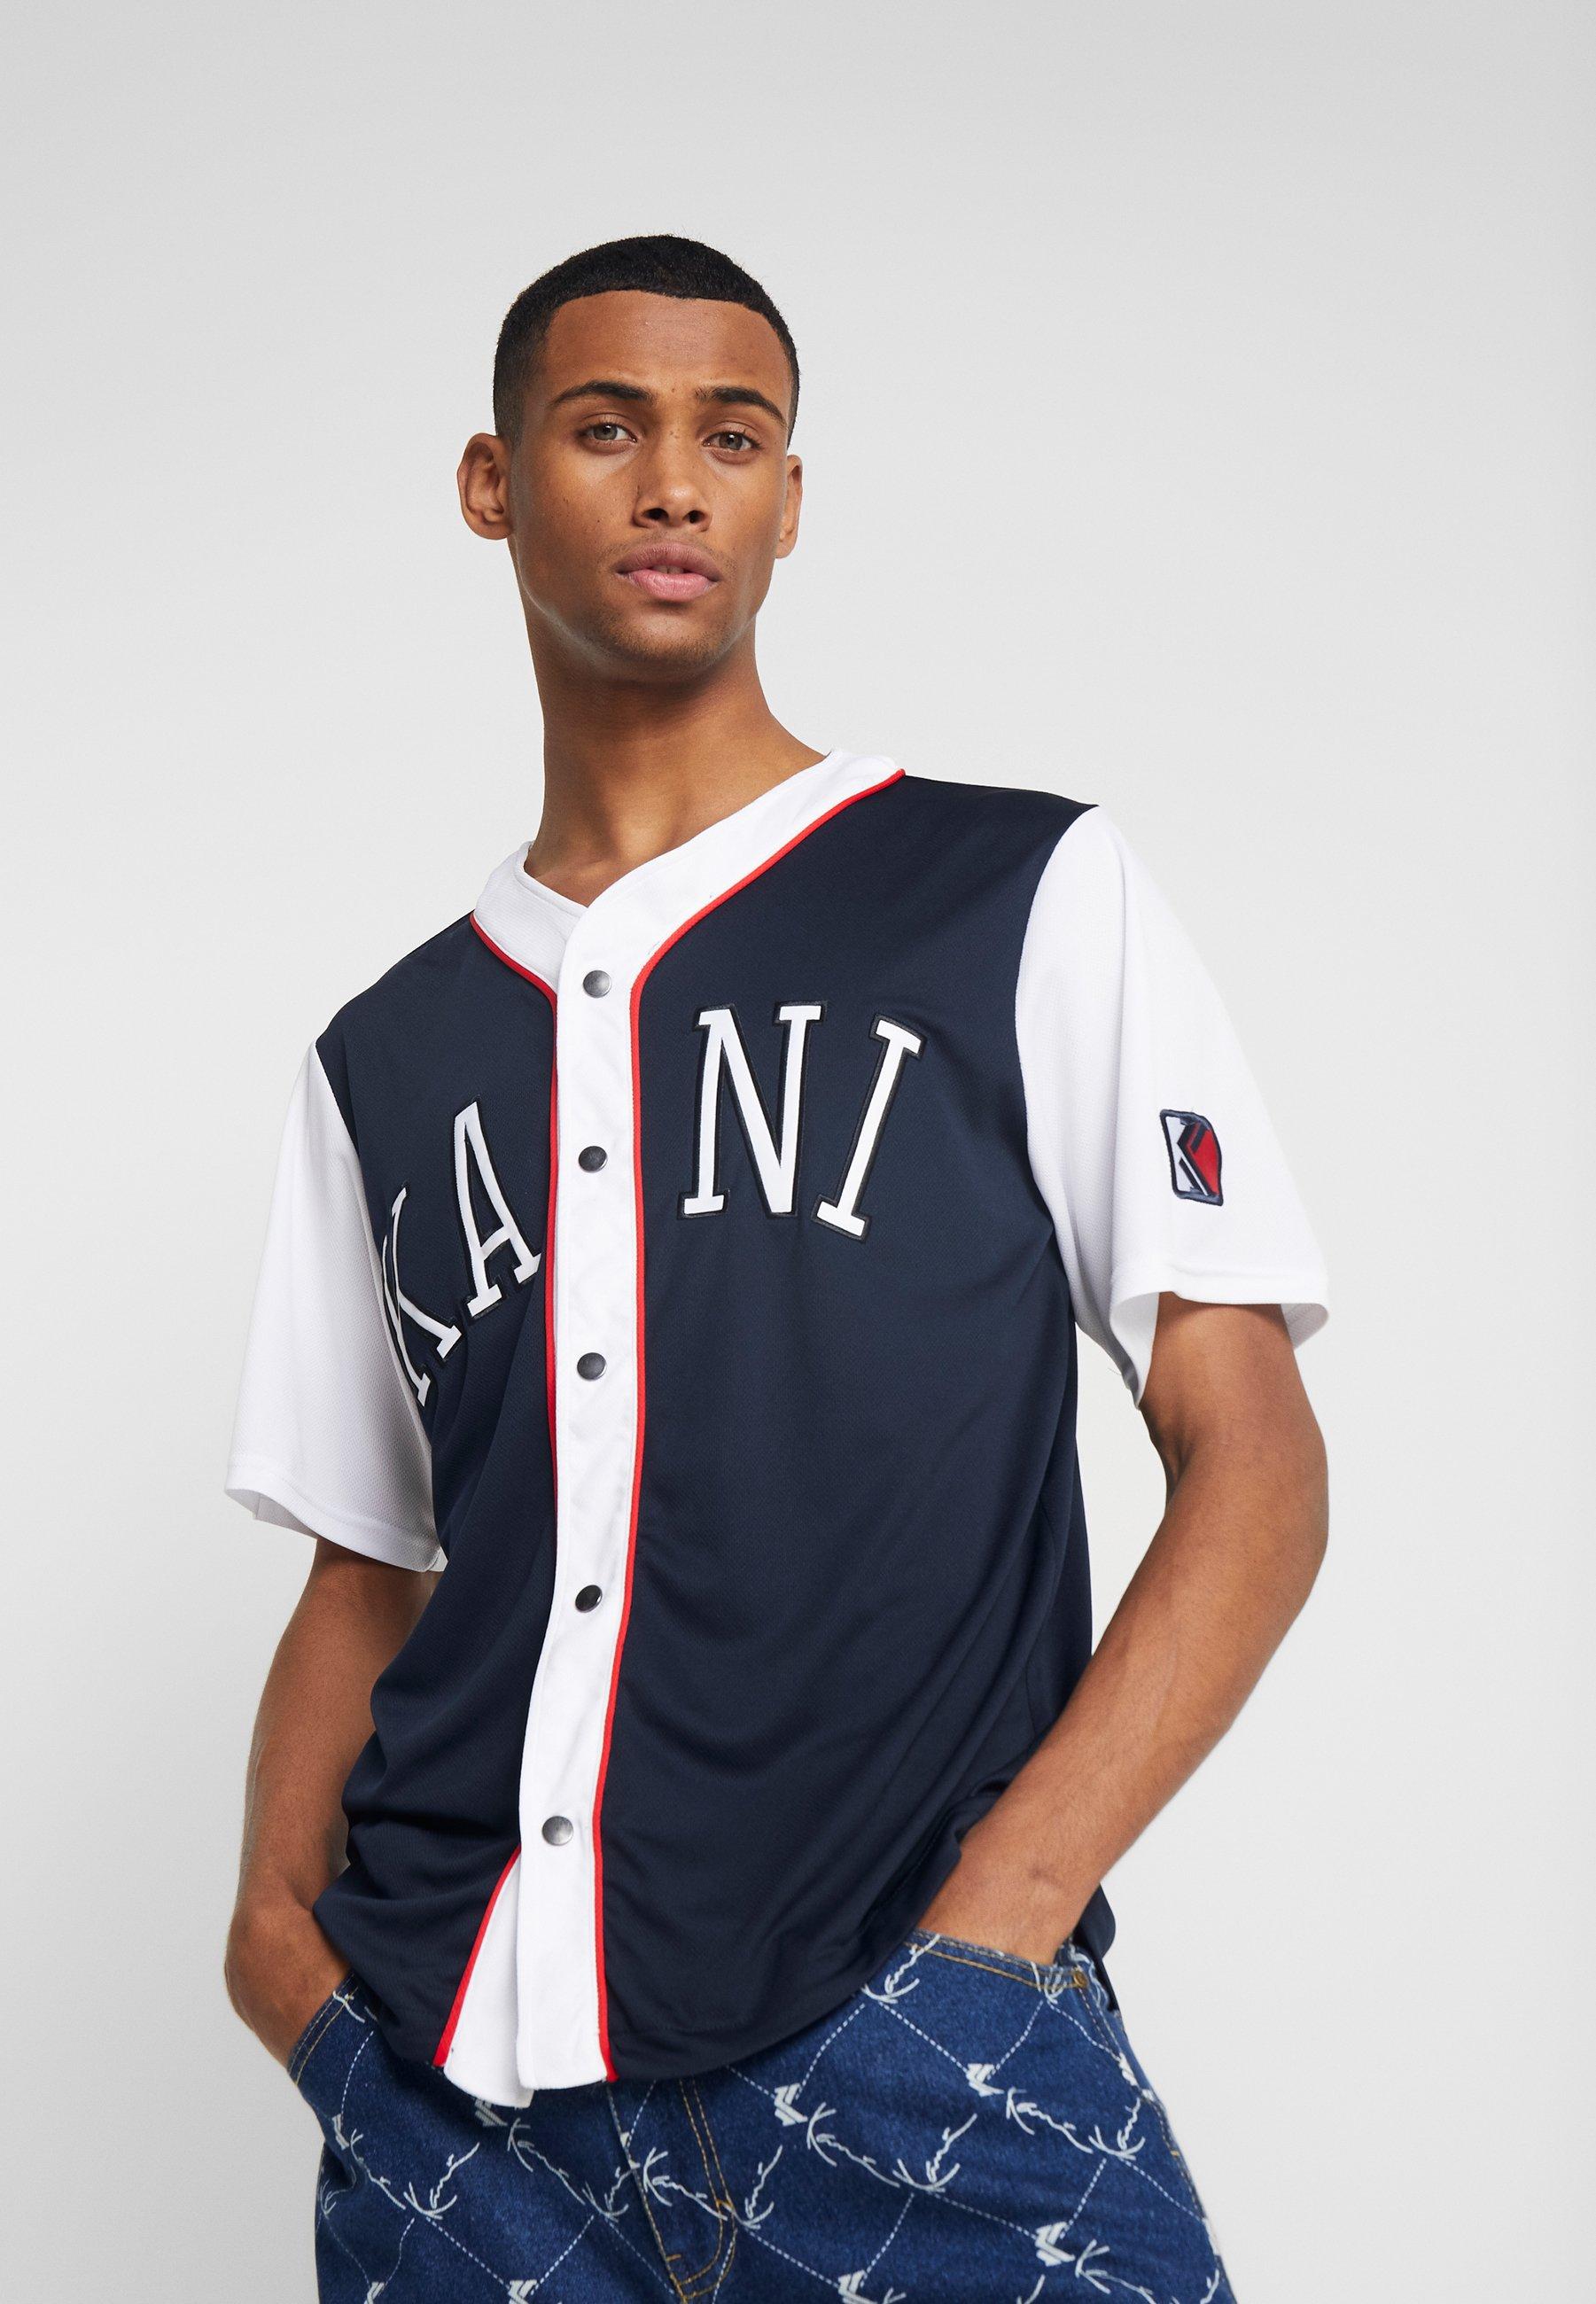 Baseball College Kani ShirtChemise Navy white Karl red 9WDIEH2Y